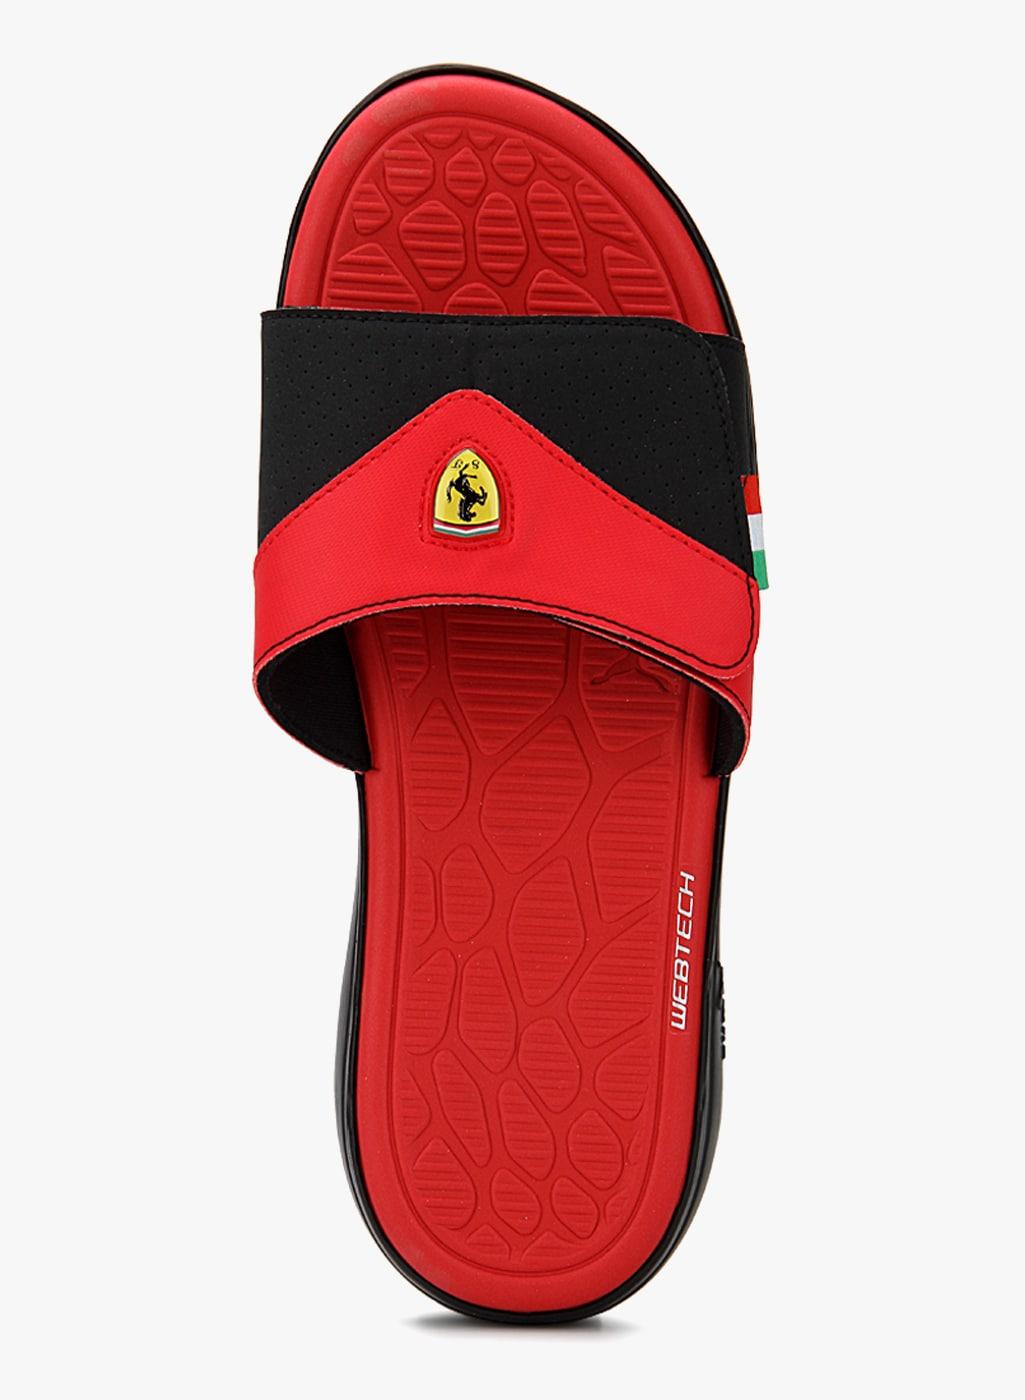 Puma Ferrari Flip Flops Off 75 Buy